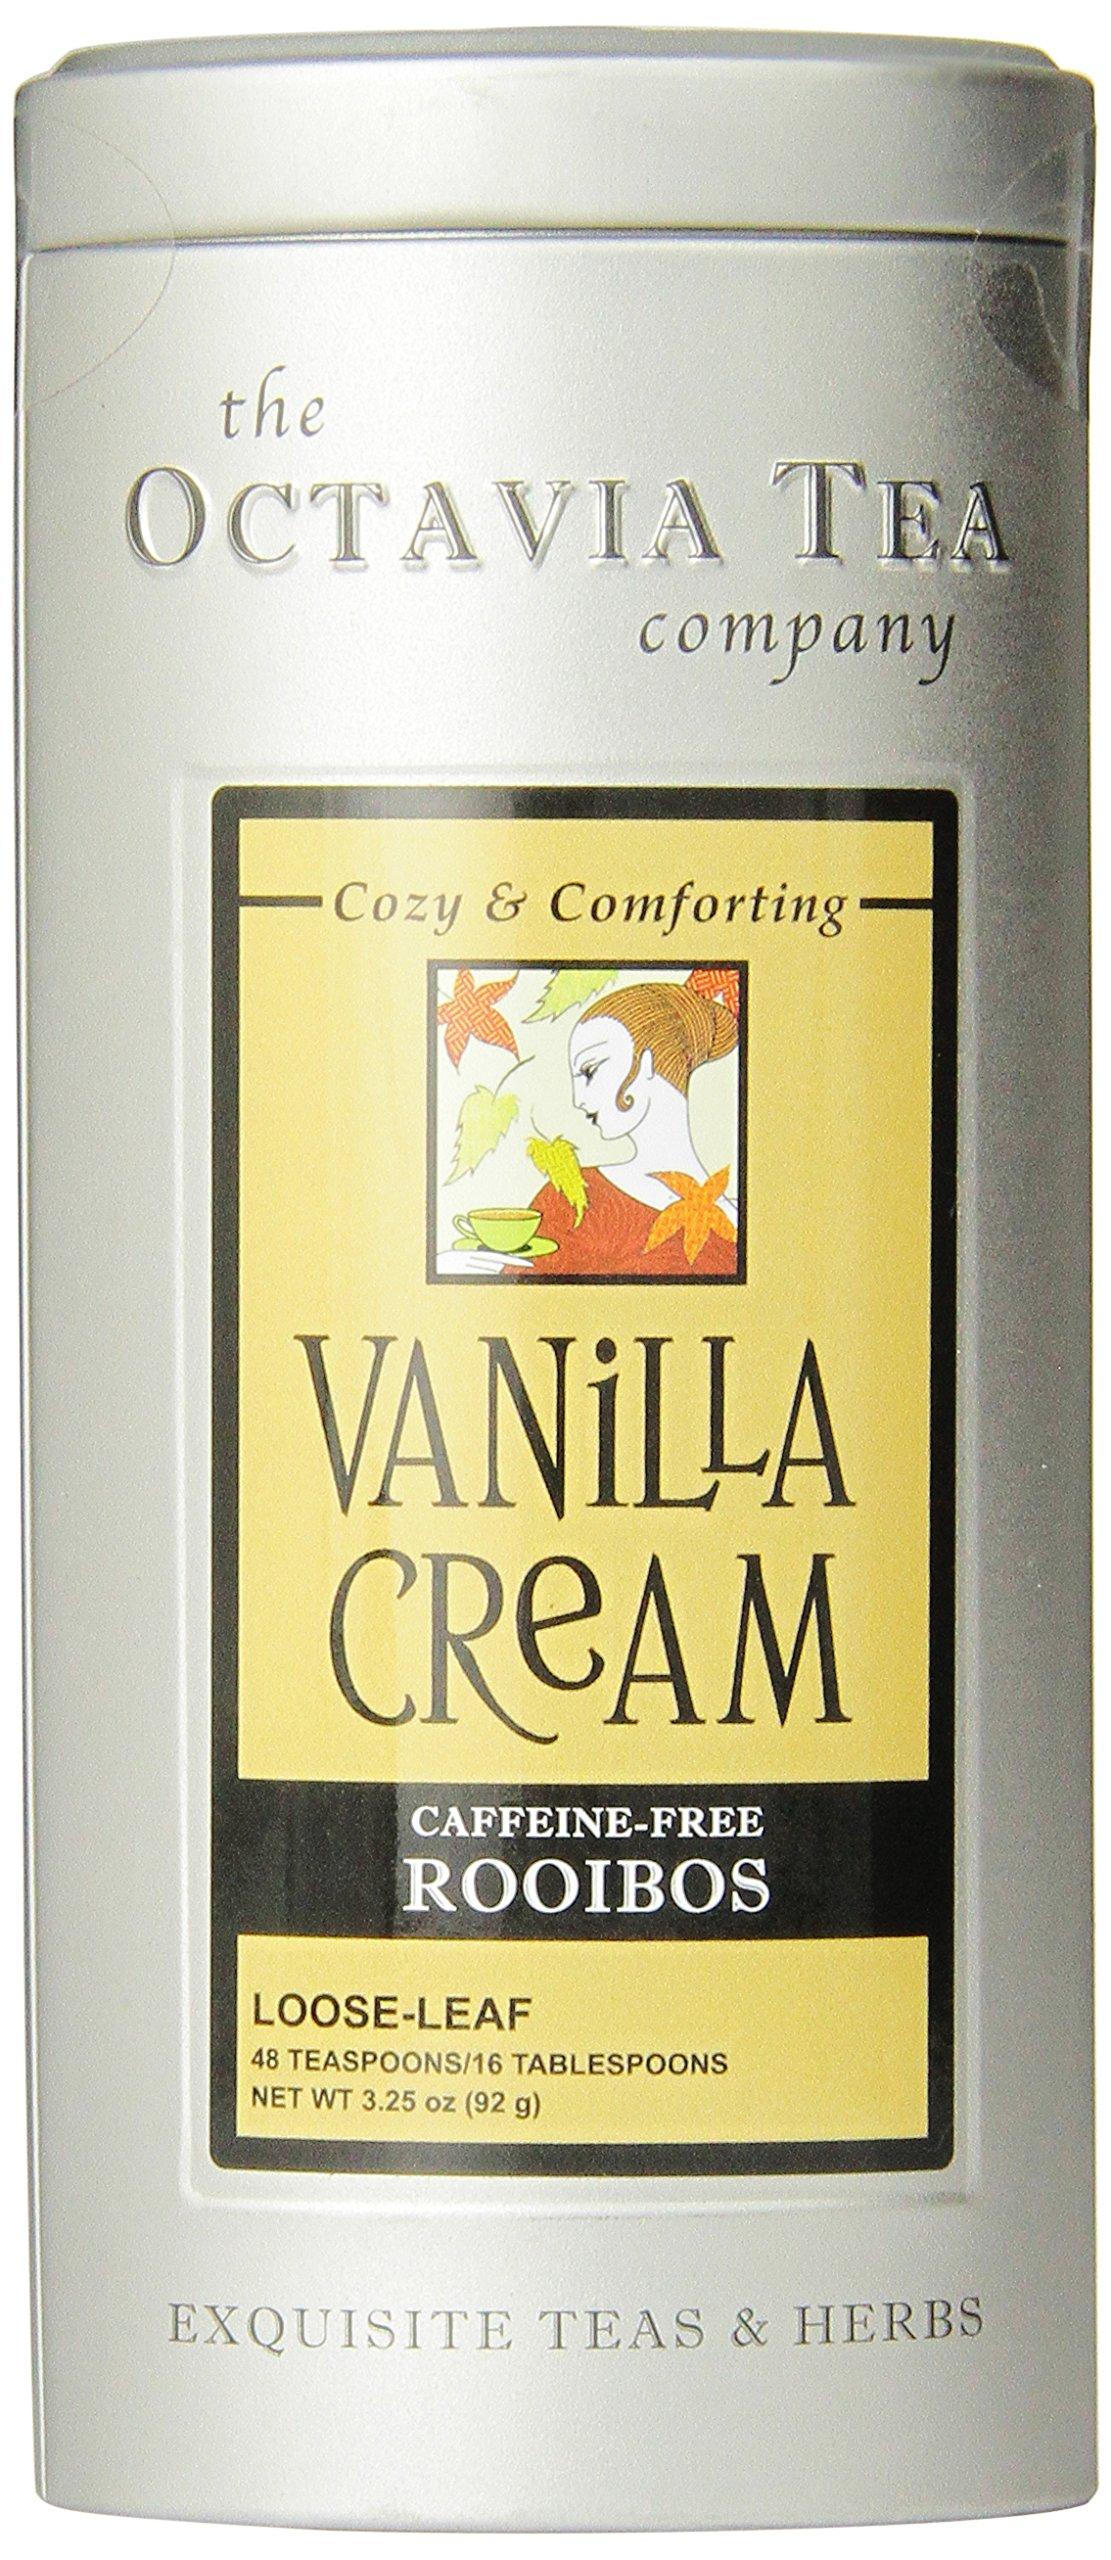 Octavia Tea Vanilla Cream (Caffeine-Free Red Tea/Rooibos) Loose Tea, 3.25 Ounce Tin